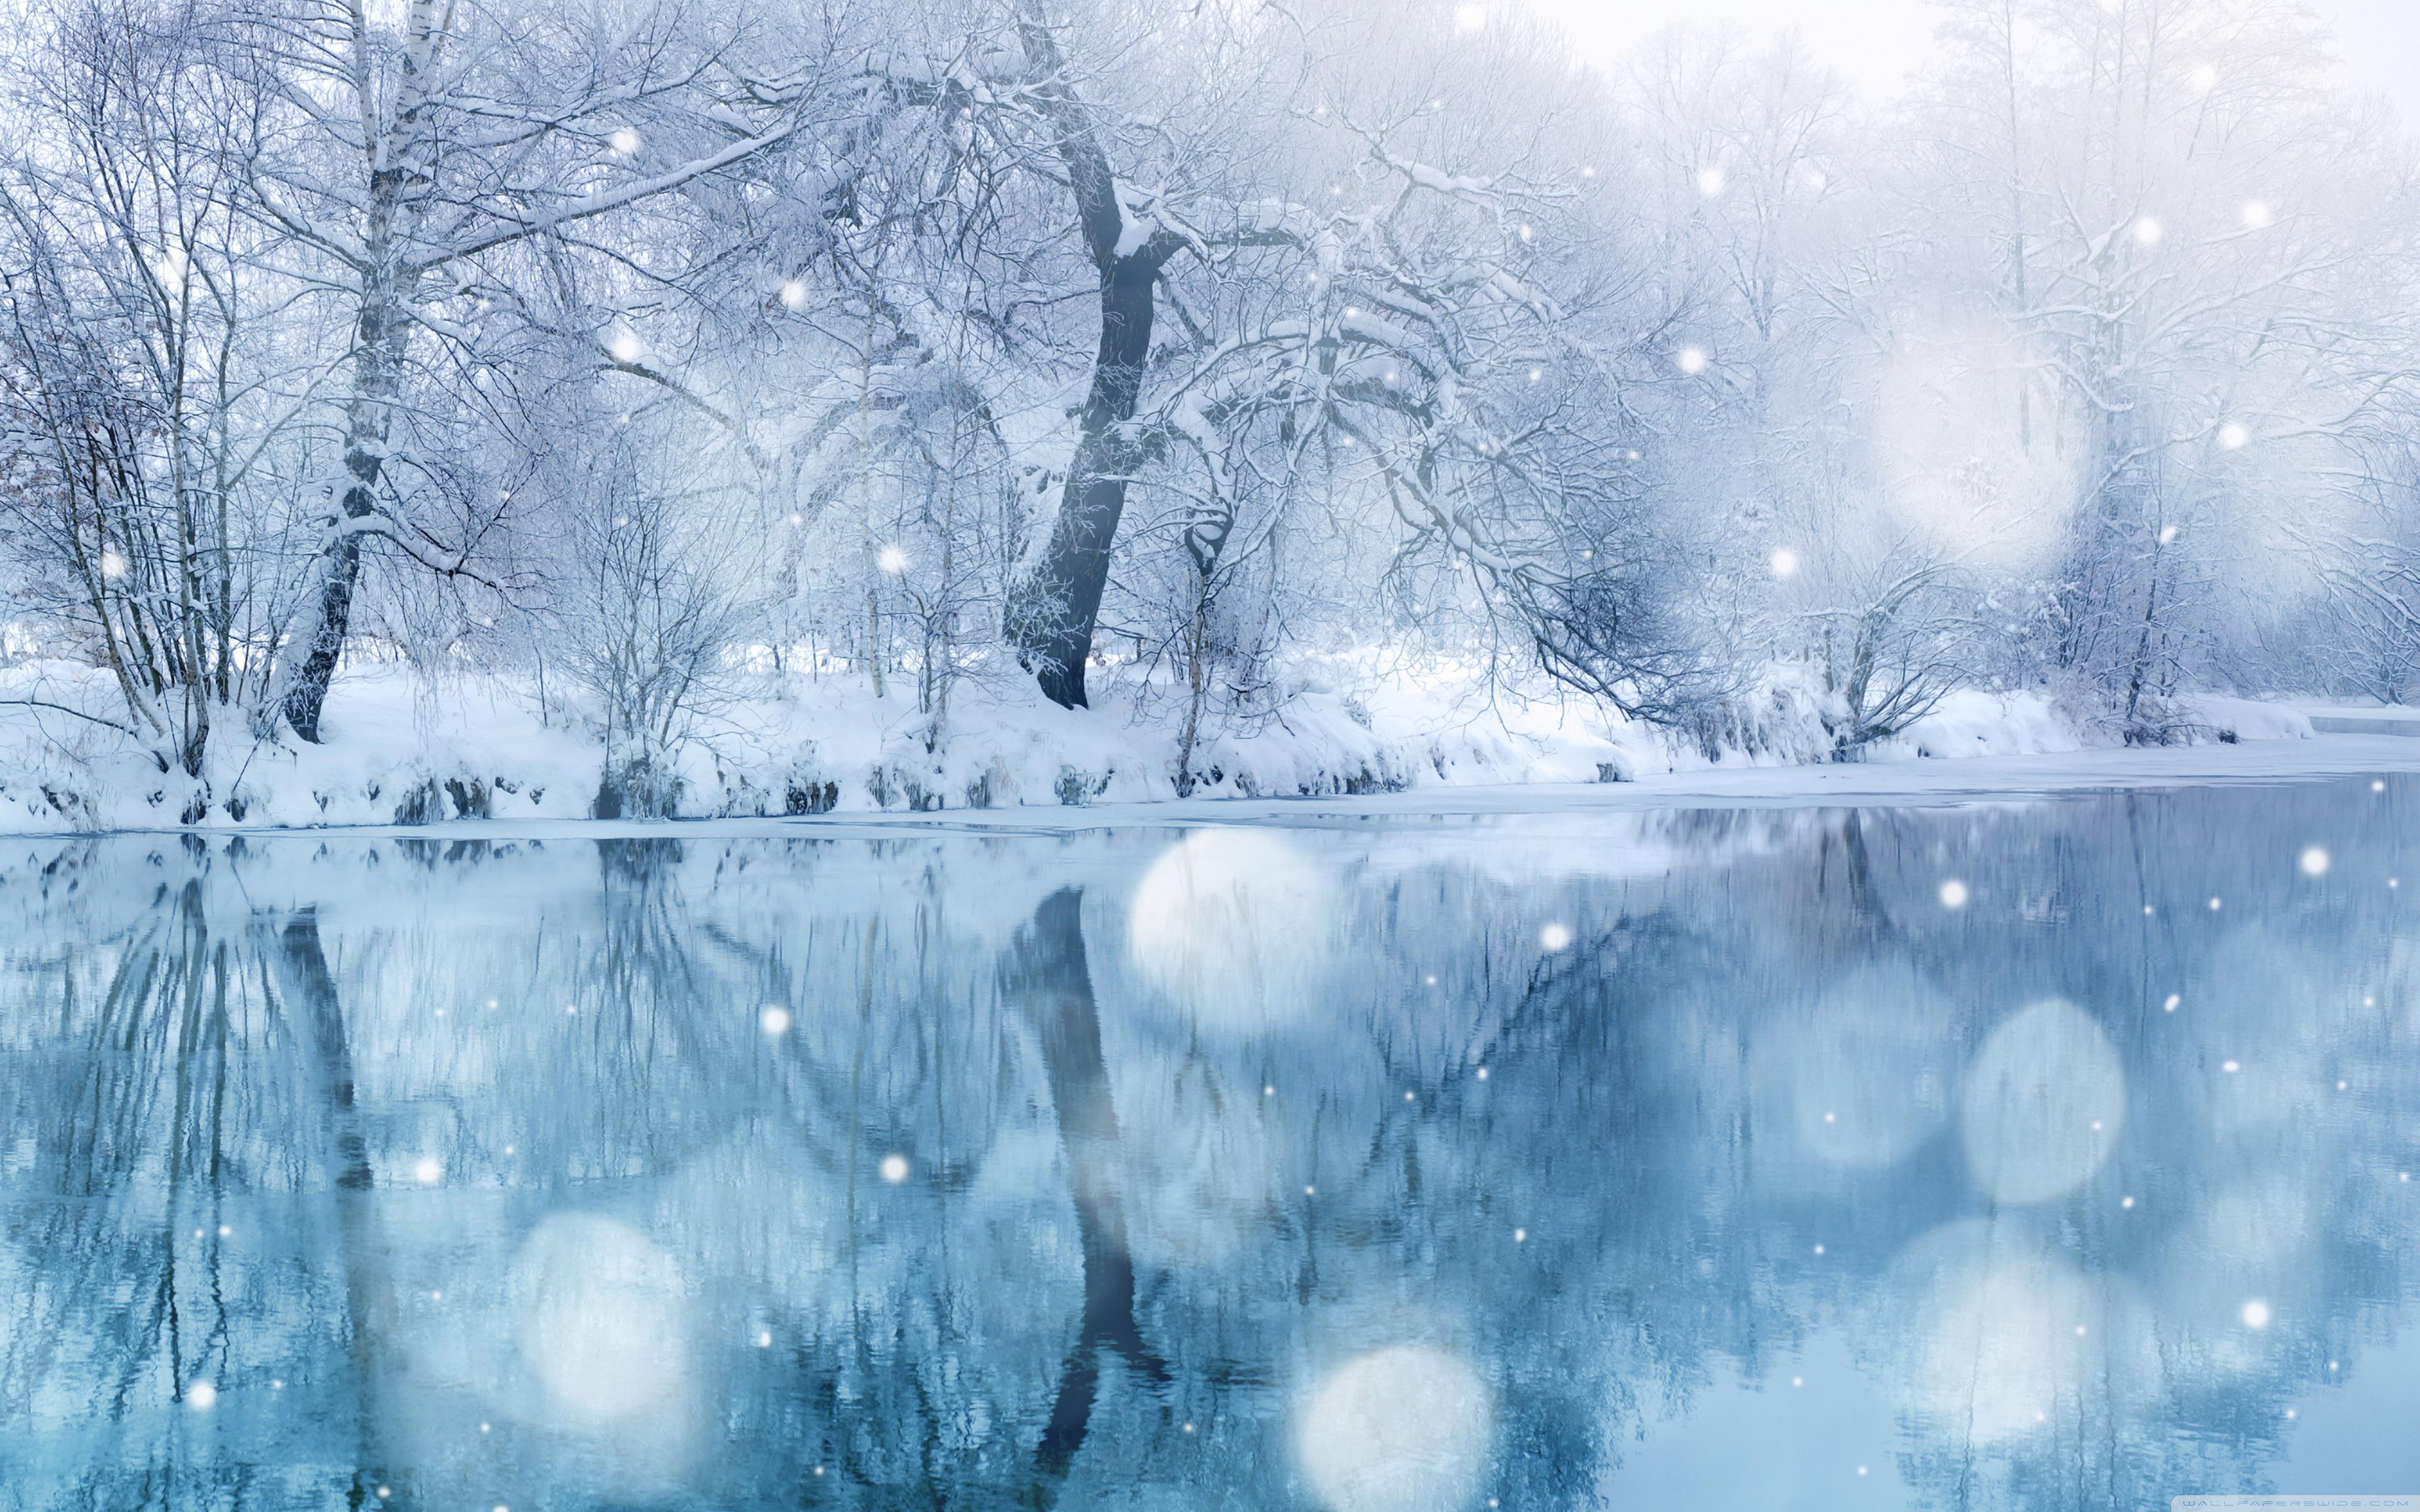 Winter Snowfall 4K HD Desktop Wallpaper for 4K Ultra HD TV 3840x2400